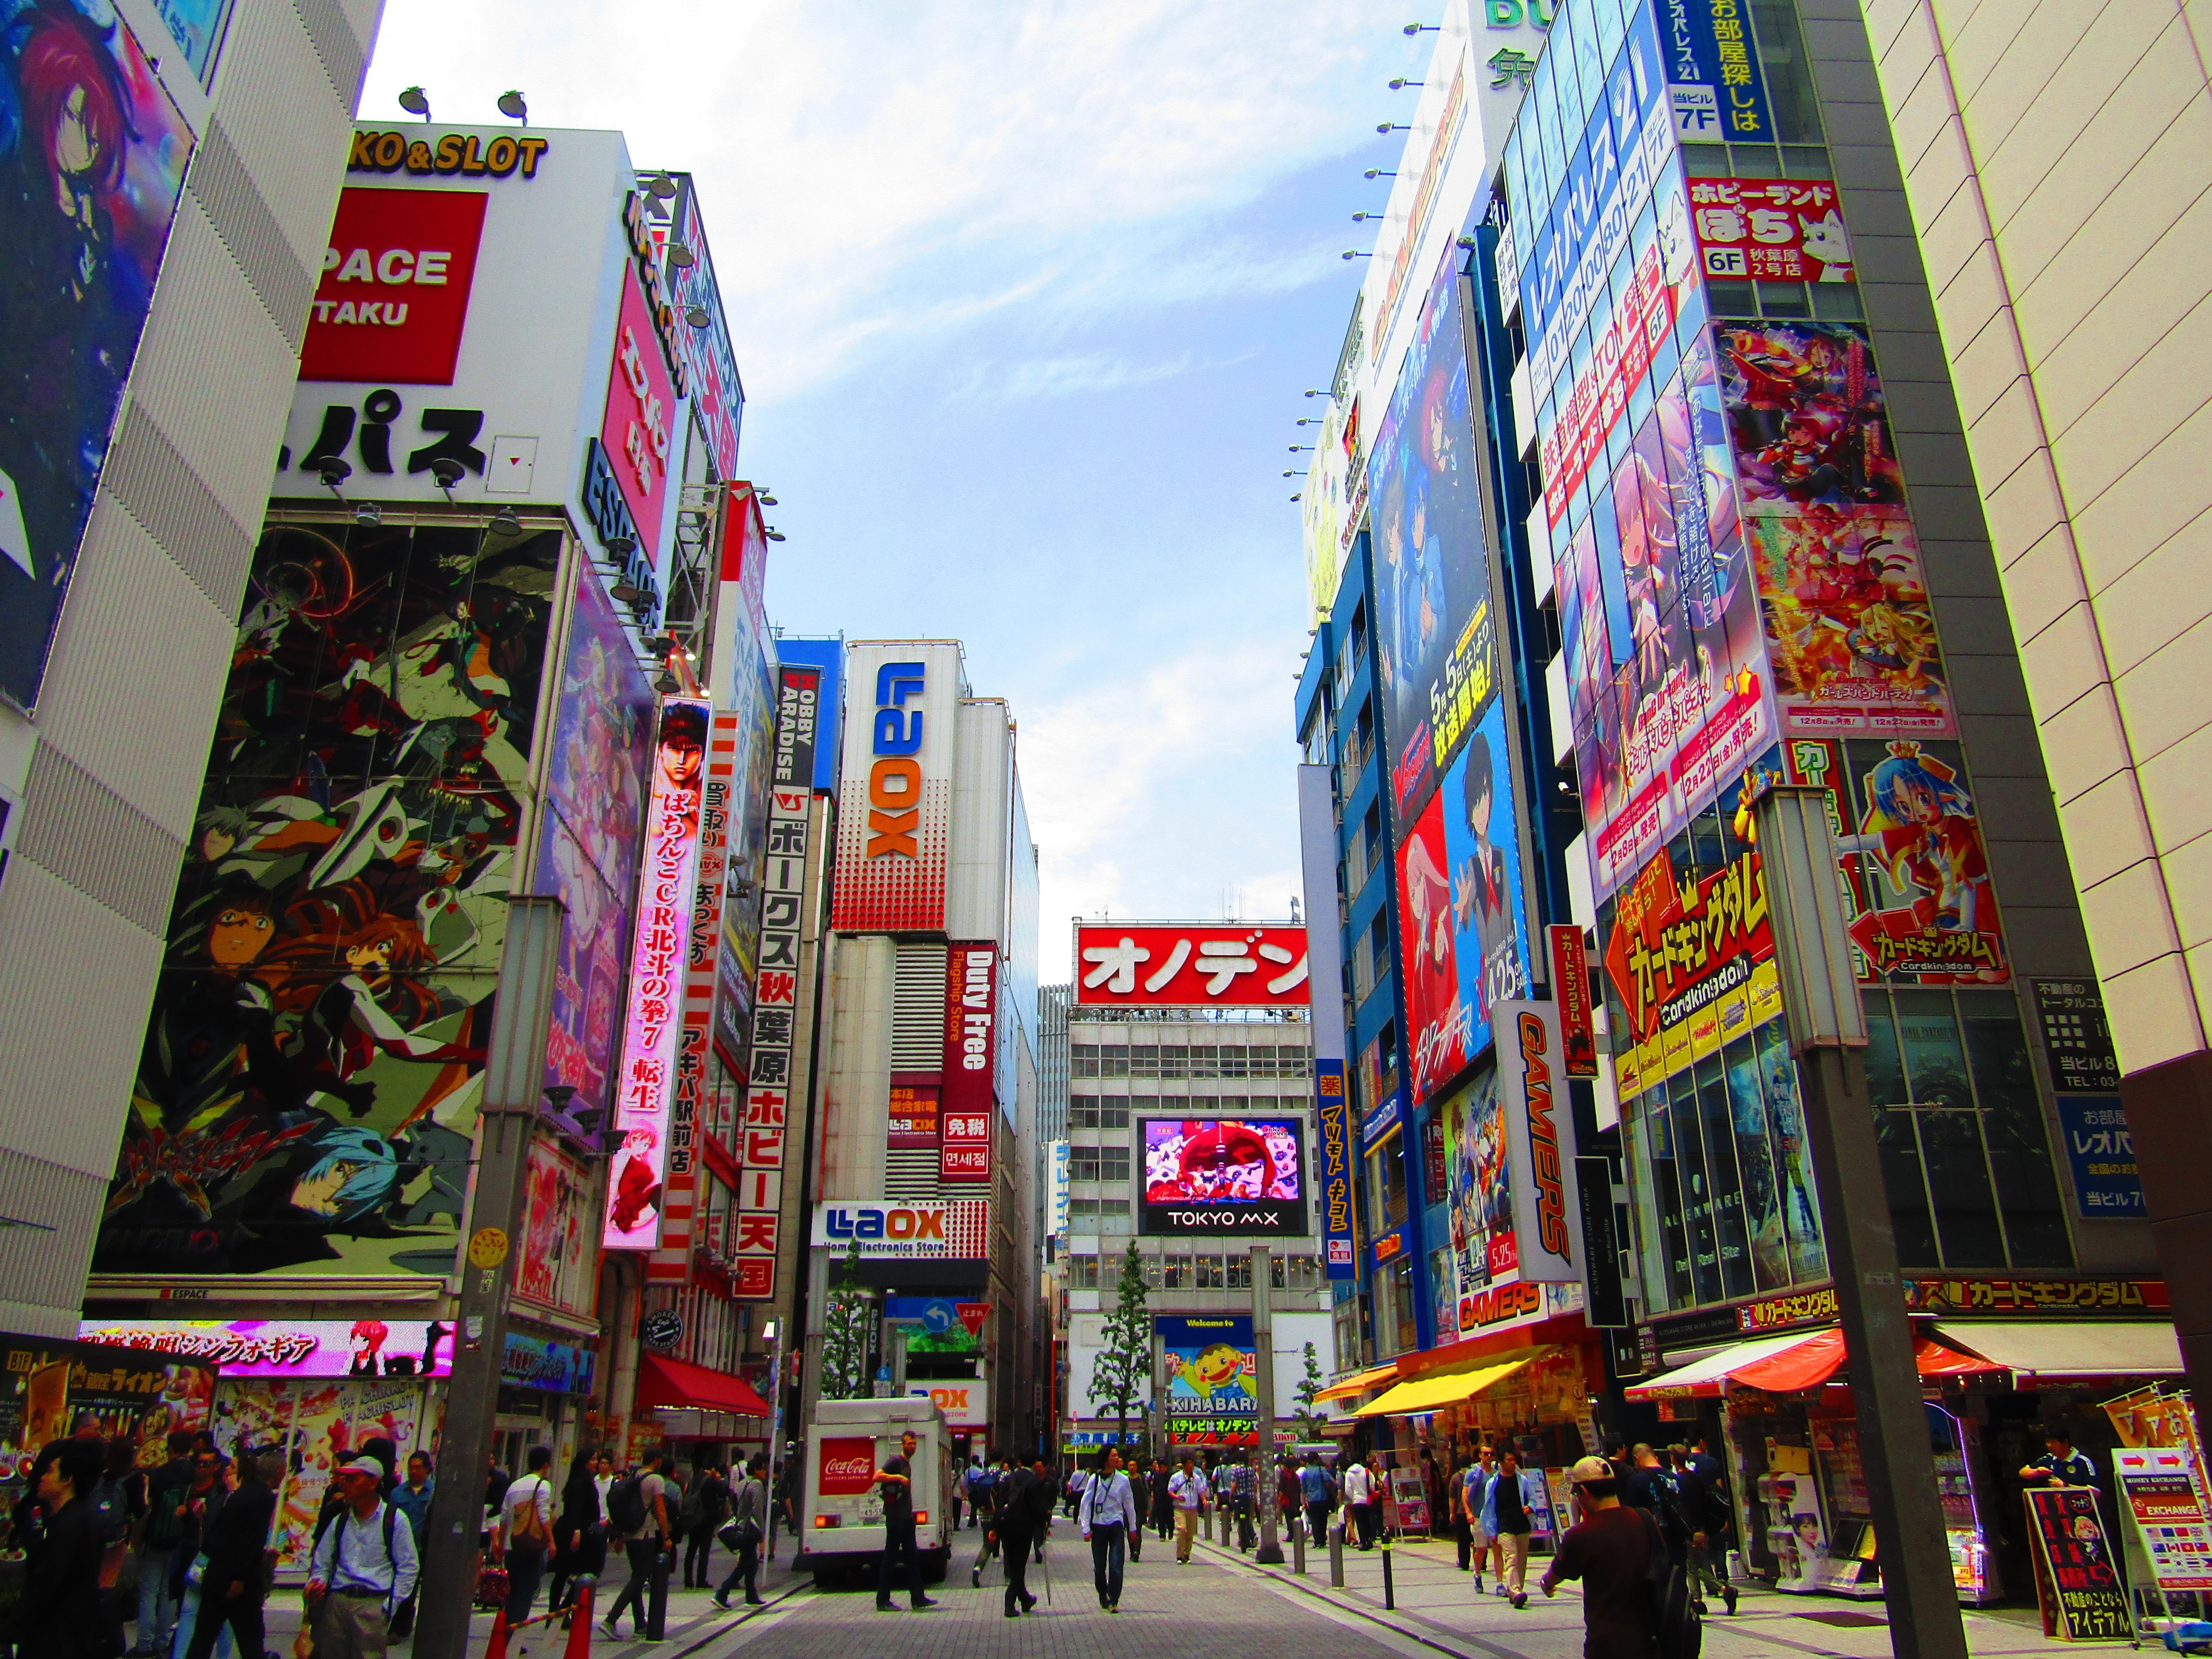 cosa vedere tokyo akihabara